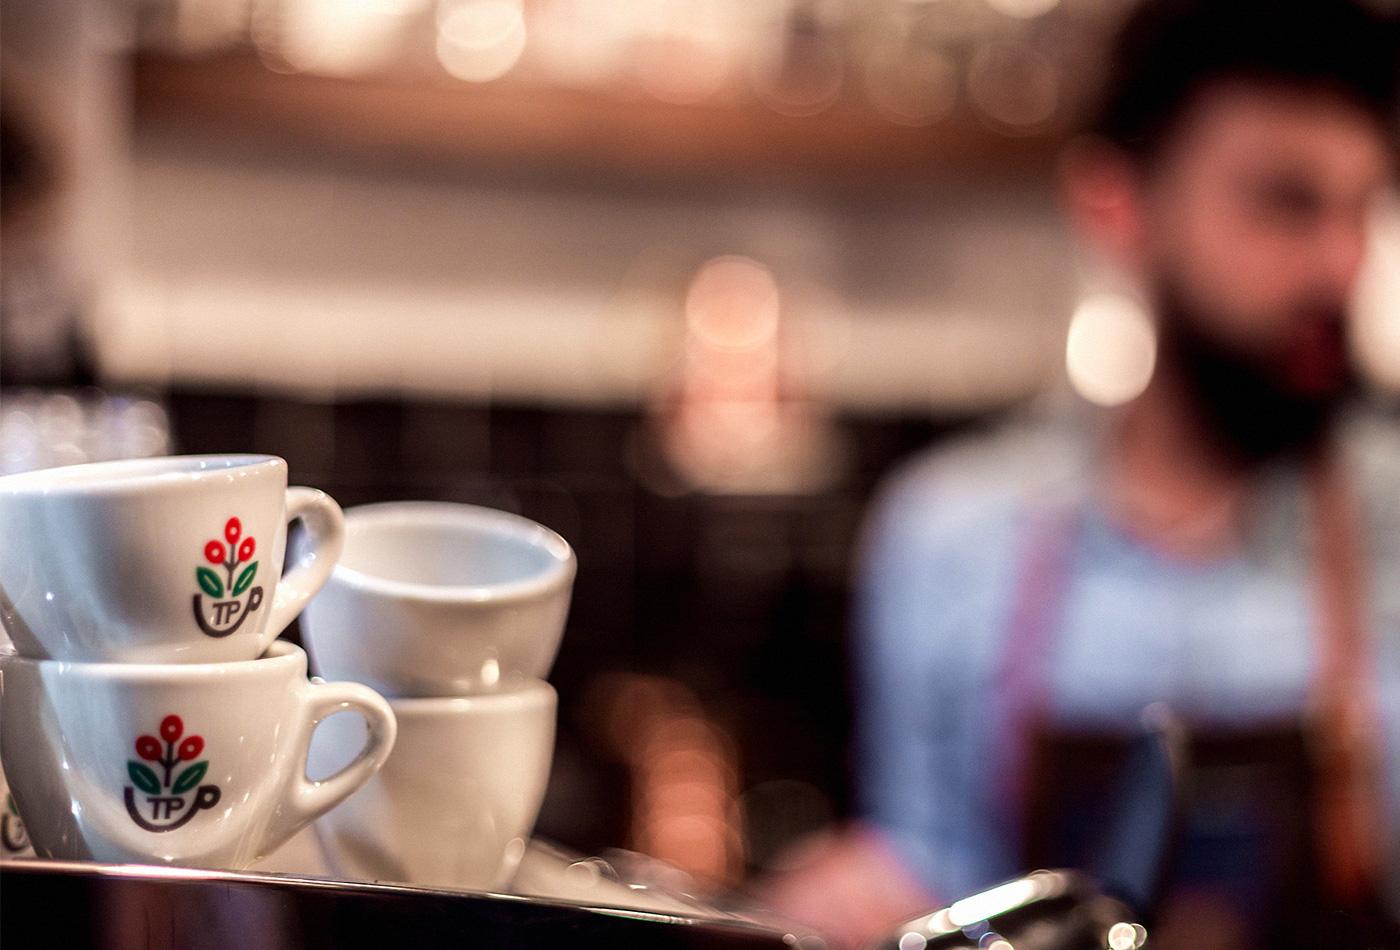 tazzepazze-tazze-pazze-caffetteria-gourmet-genova-coffee-specialty-brewing-andrea-cremone-barista-baristas-branding-vacaliebres-logo-10.03.15